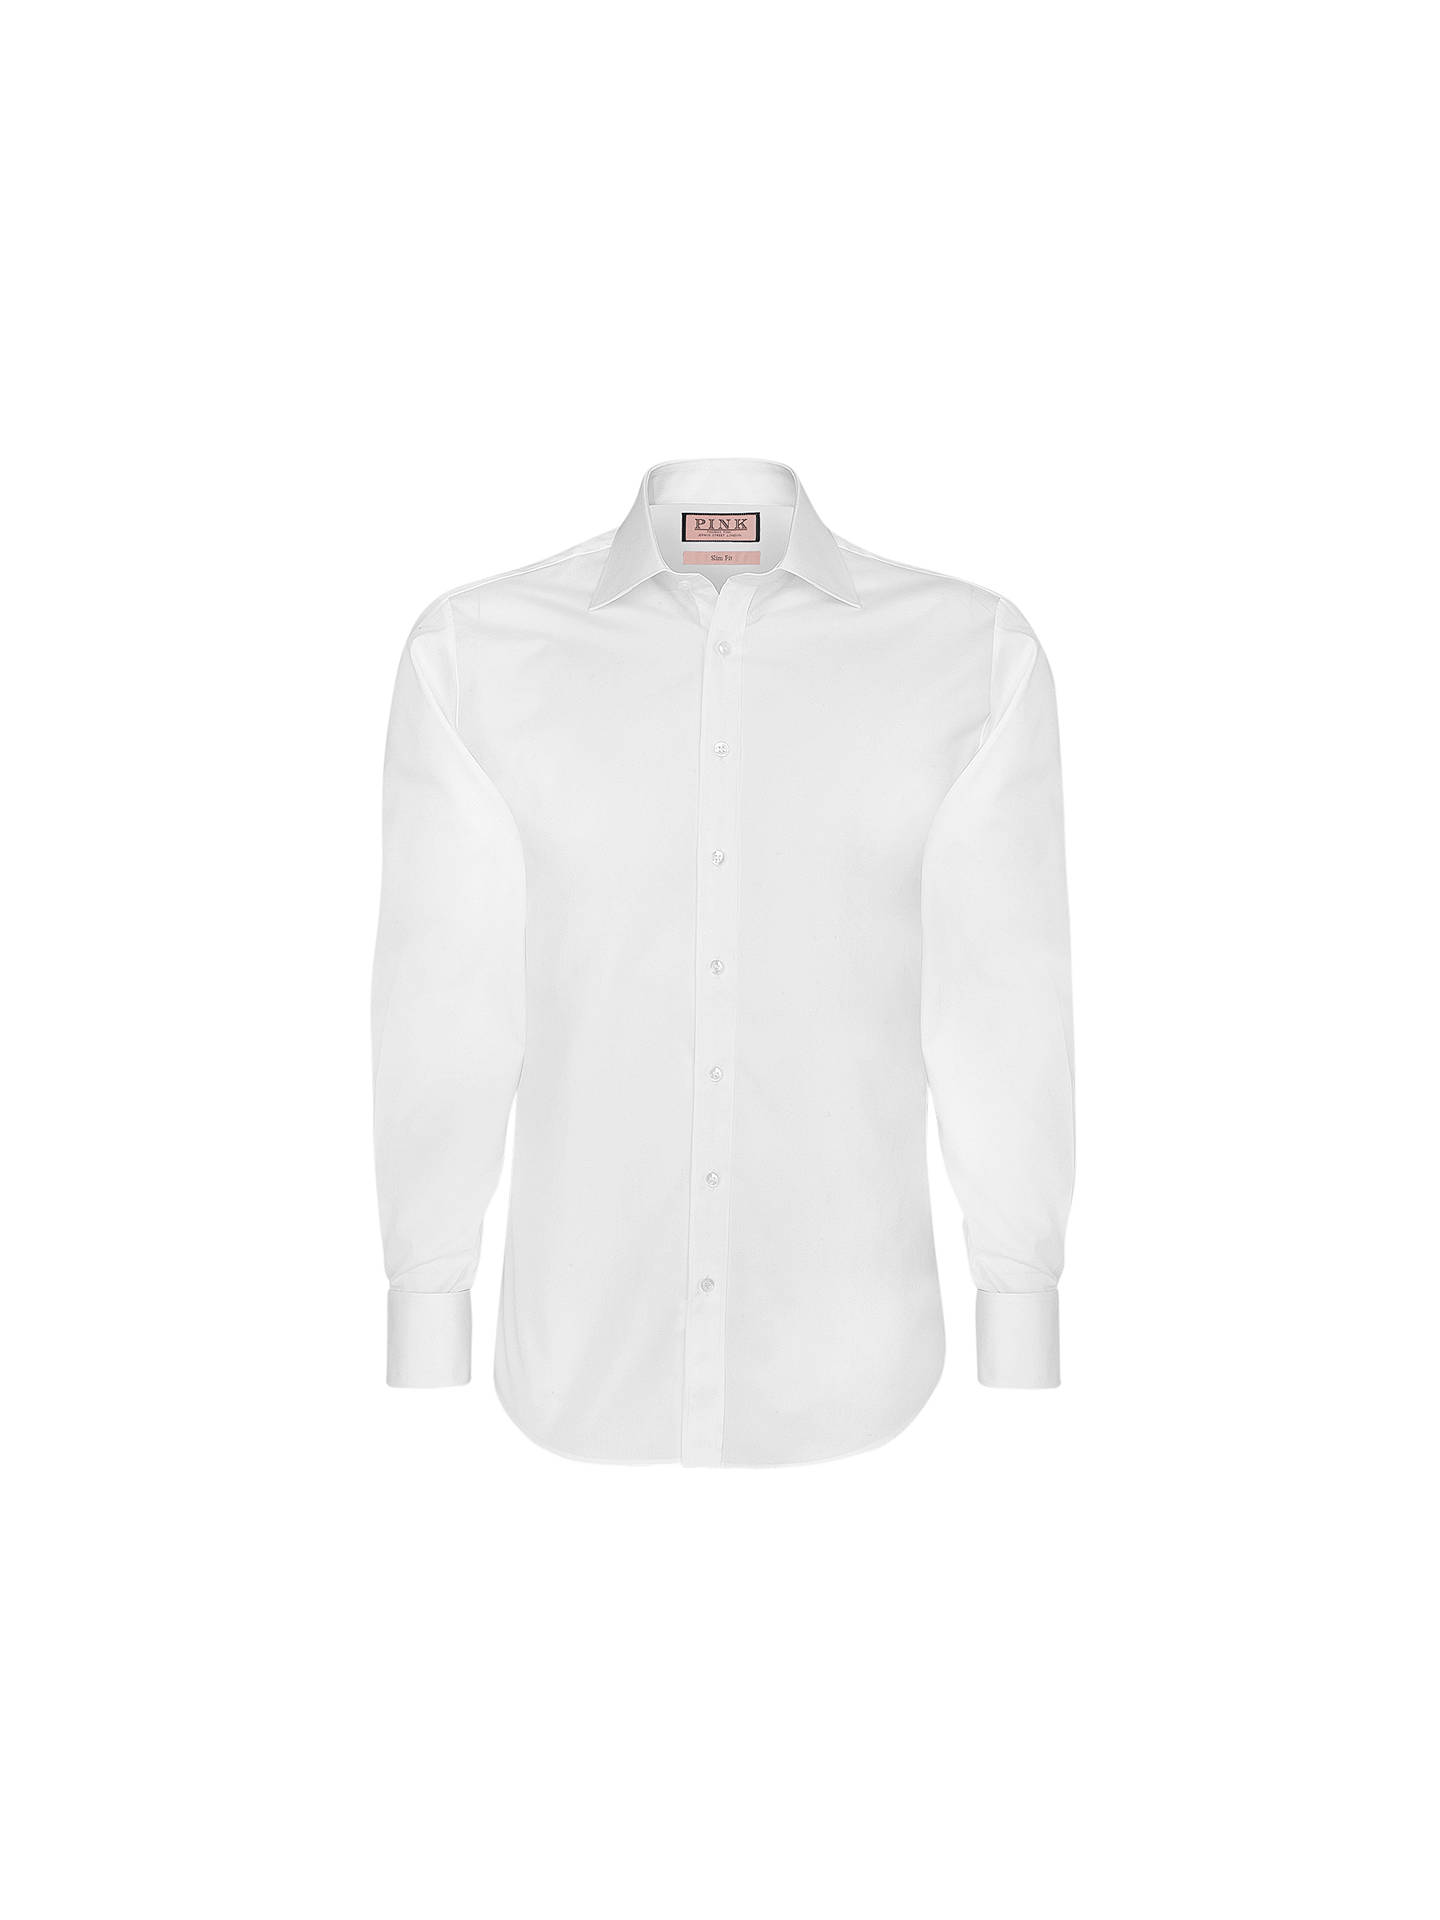 Thomas Pink Solid Slim Fit Single Cuff Dress Shirt White At John